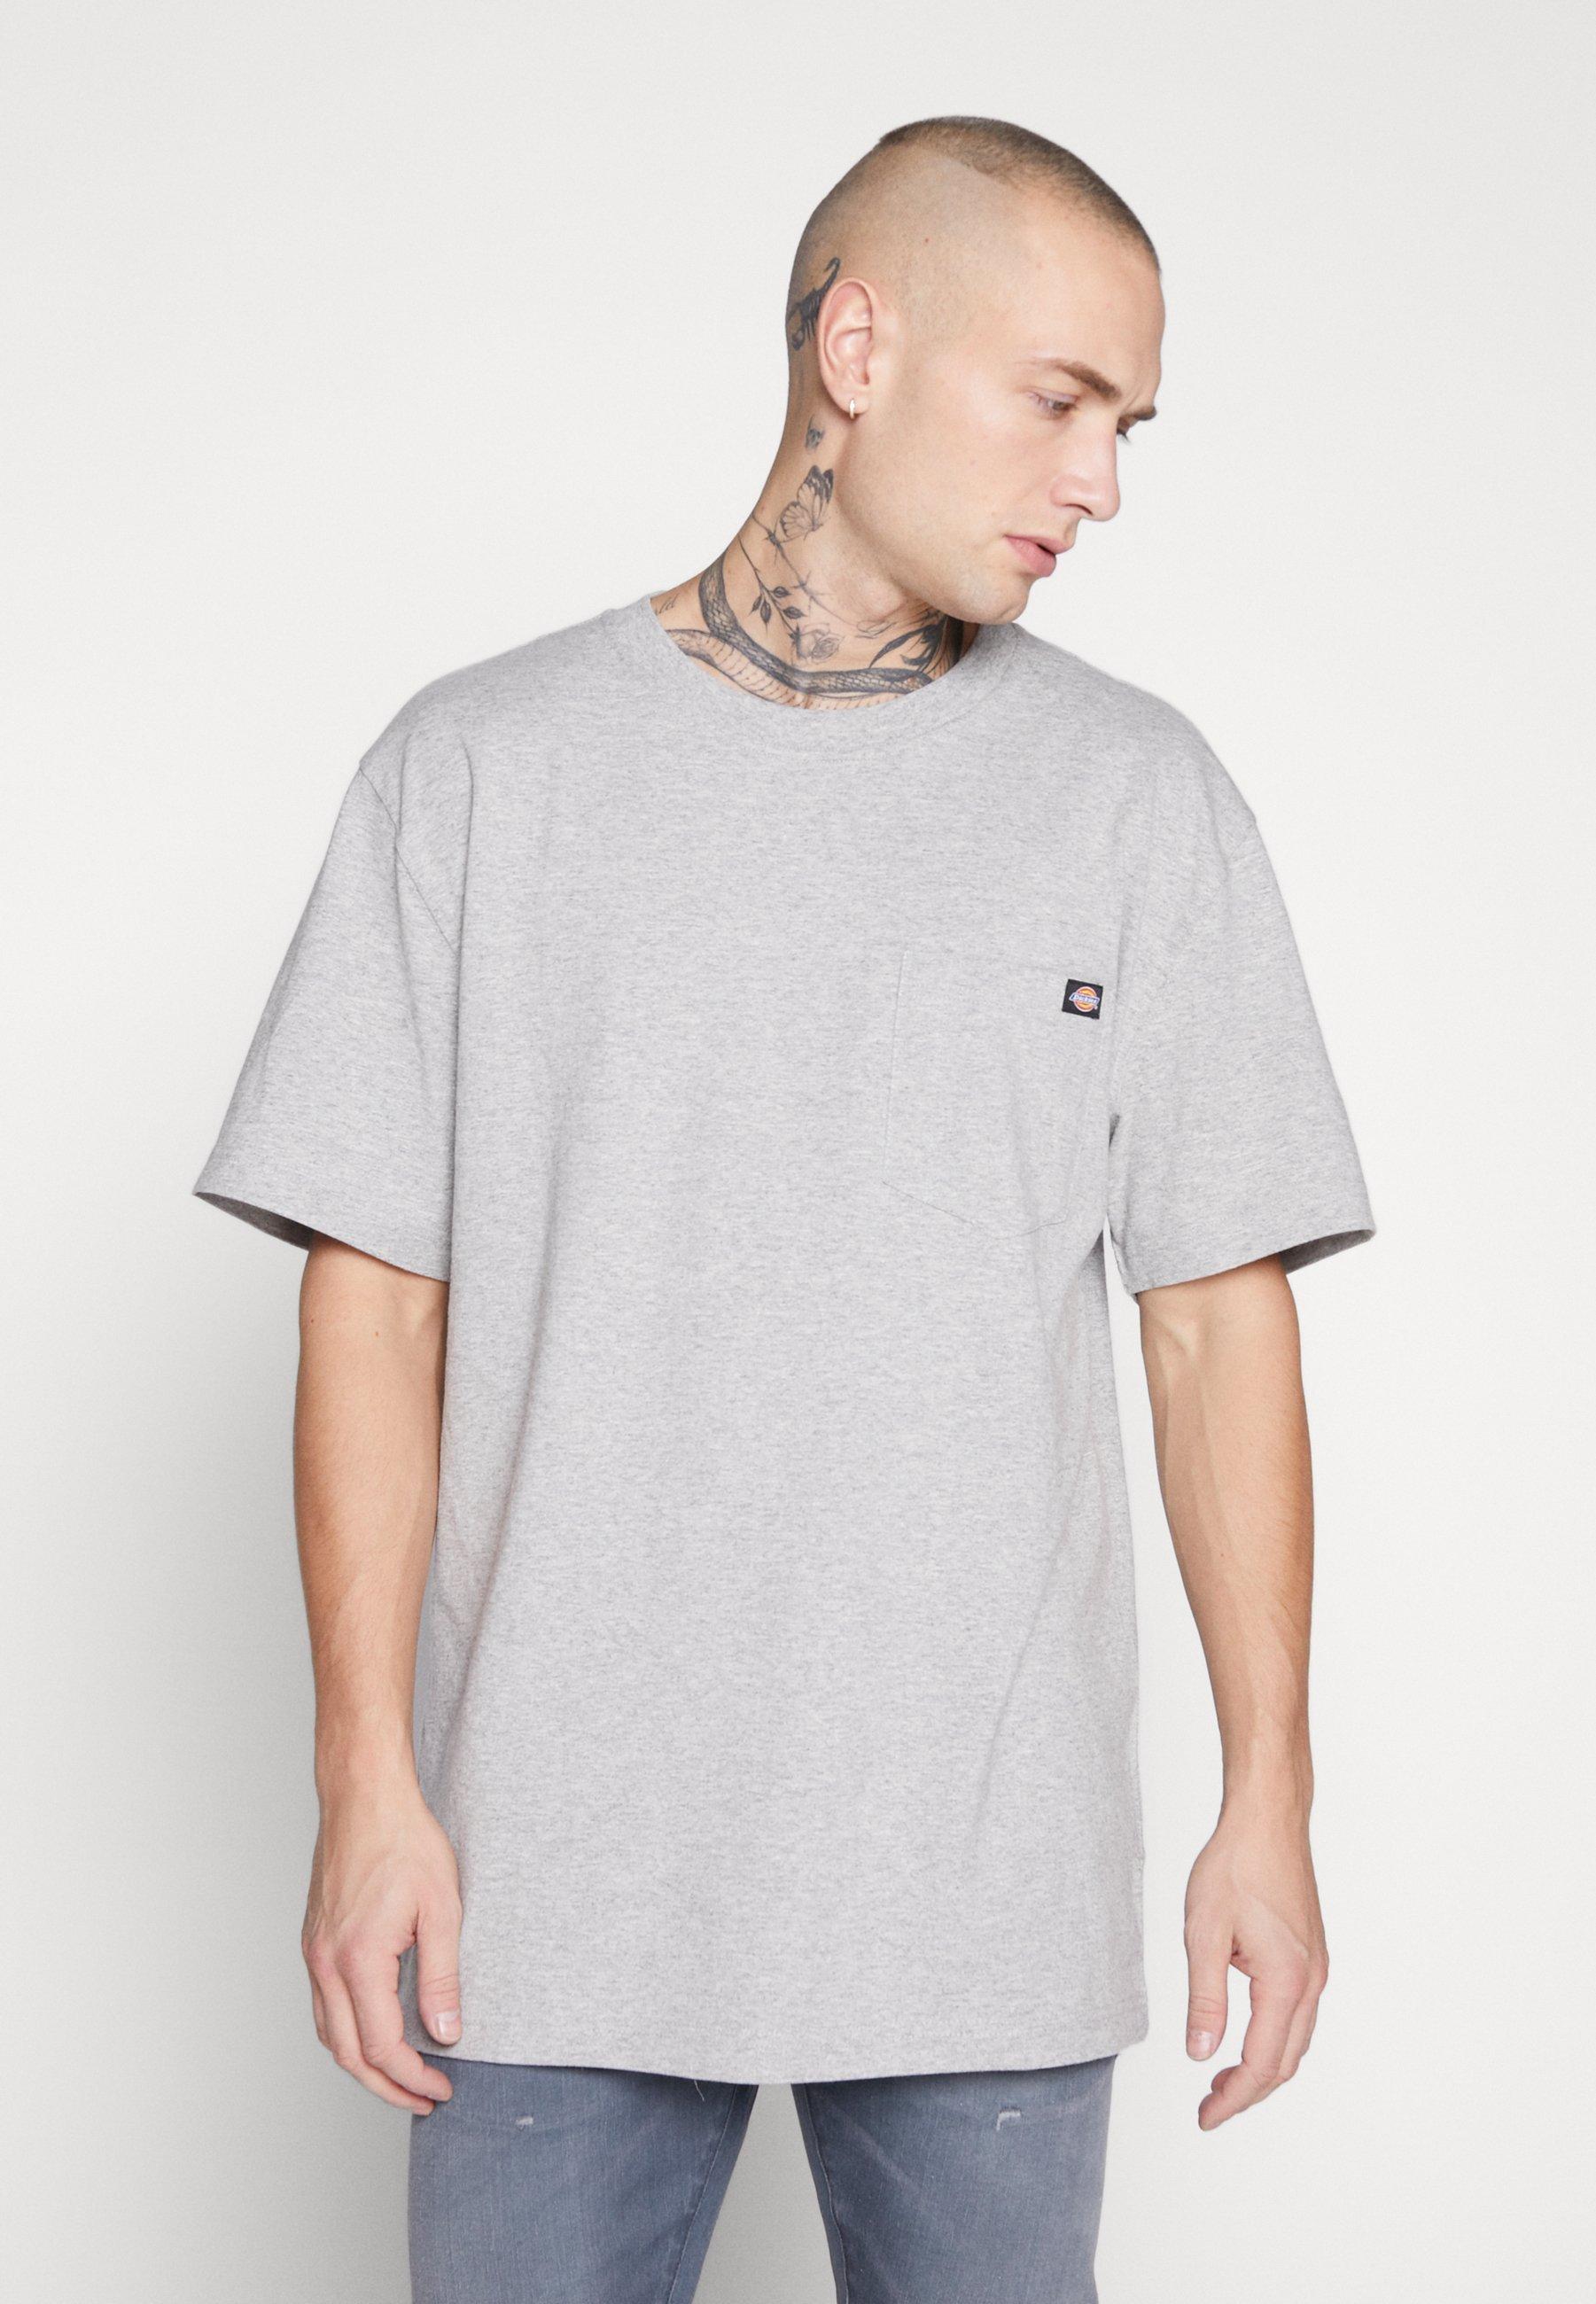 Homme PORTERDALE POCKET TEE - T-shirt basique